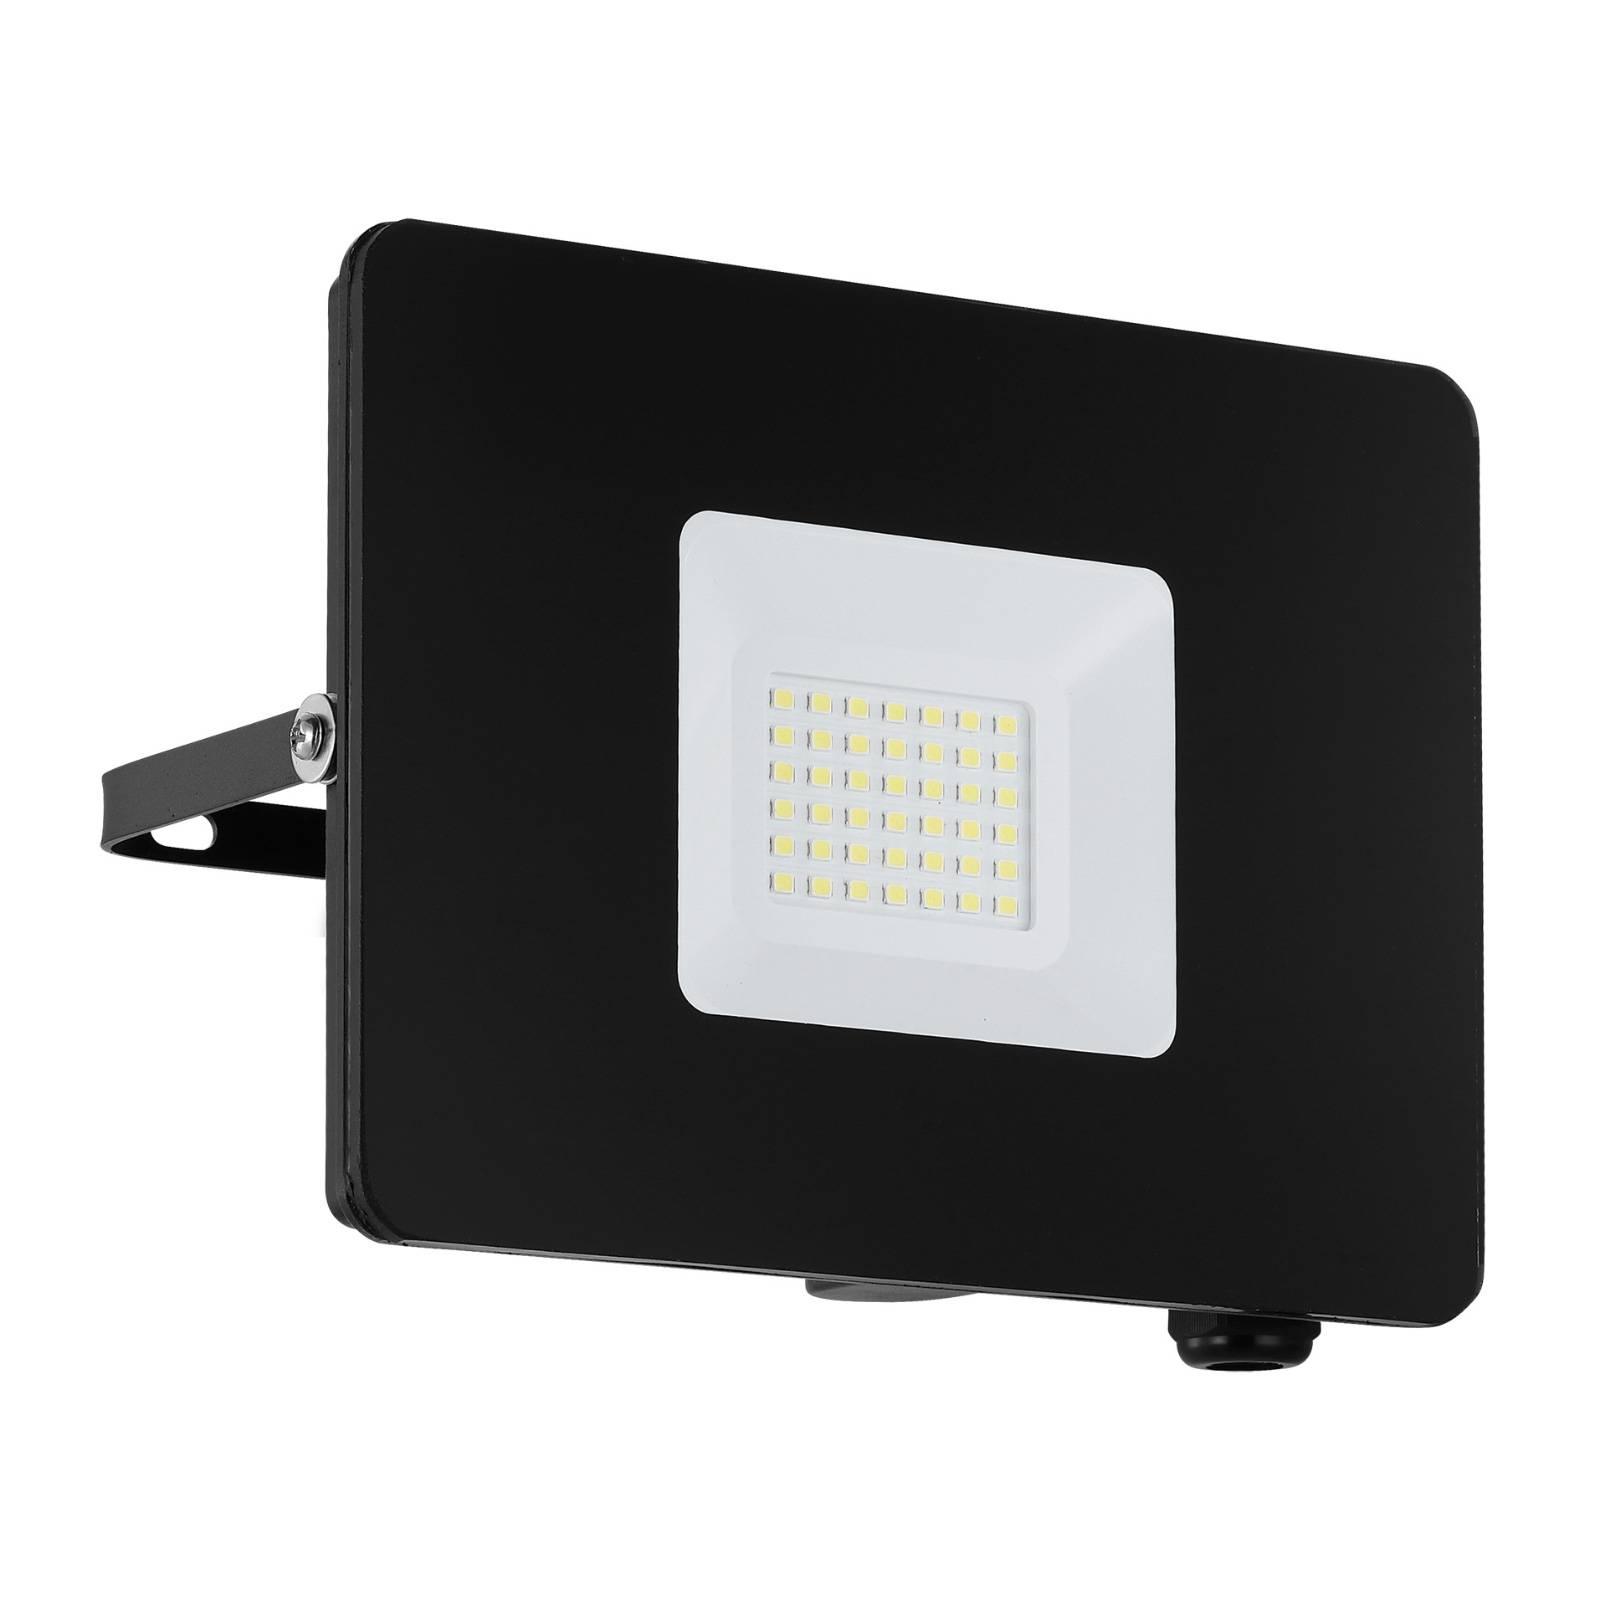 LED-kohdevalaisin ulos Faedo 3, musta, 30 W